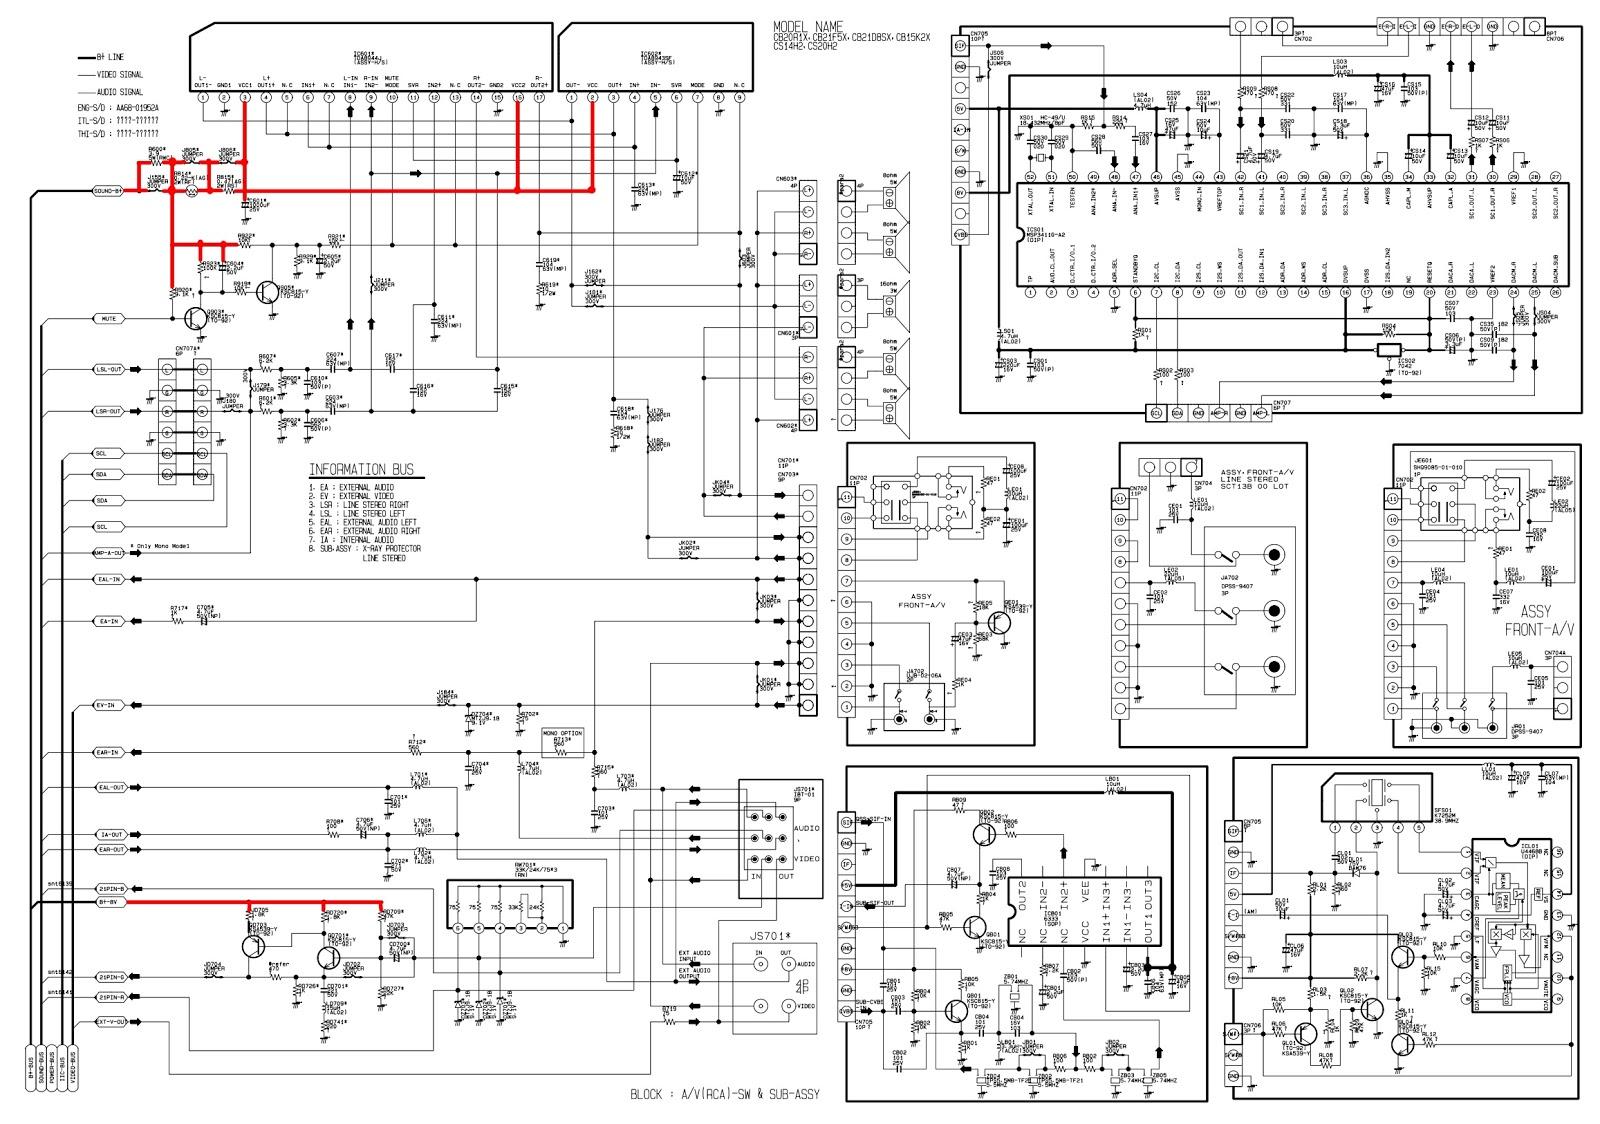 Schematic Diagrams: Samsung CS21M16MJZXNWT CRT TV